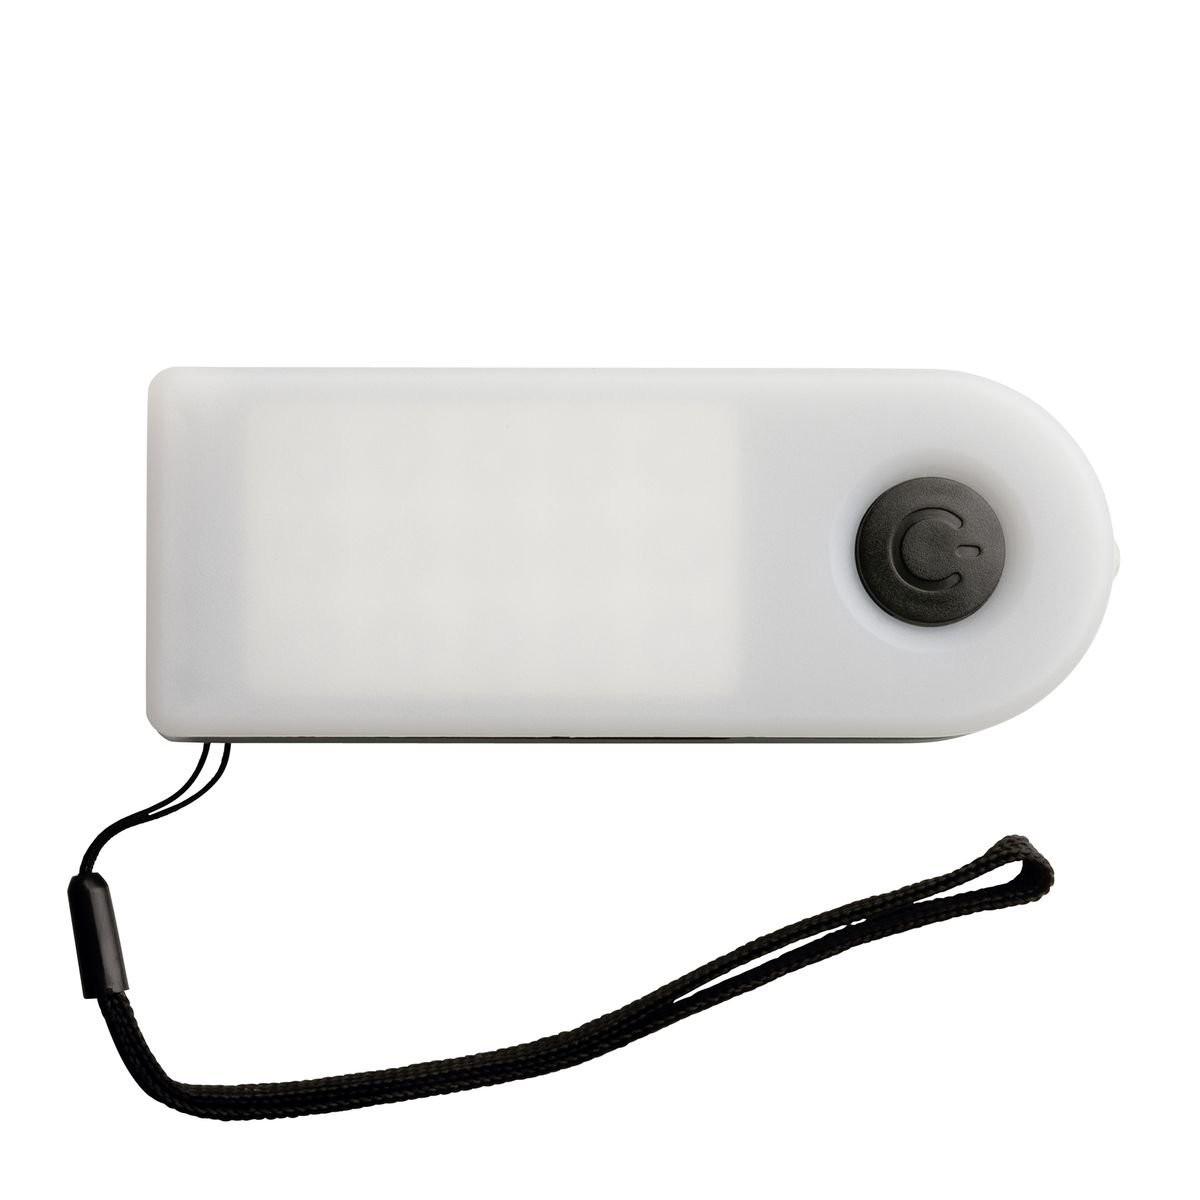 LED Taschenlampe REFLECTS-KEMI WHITE, Ansicht 4